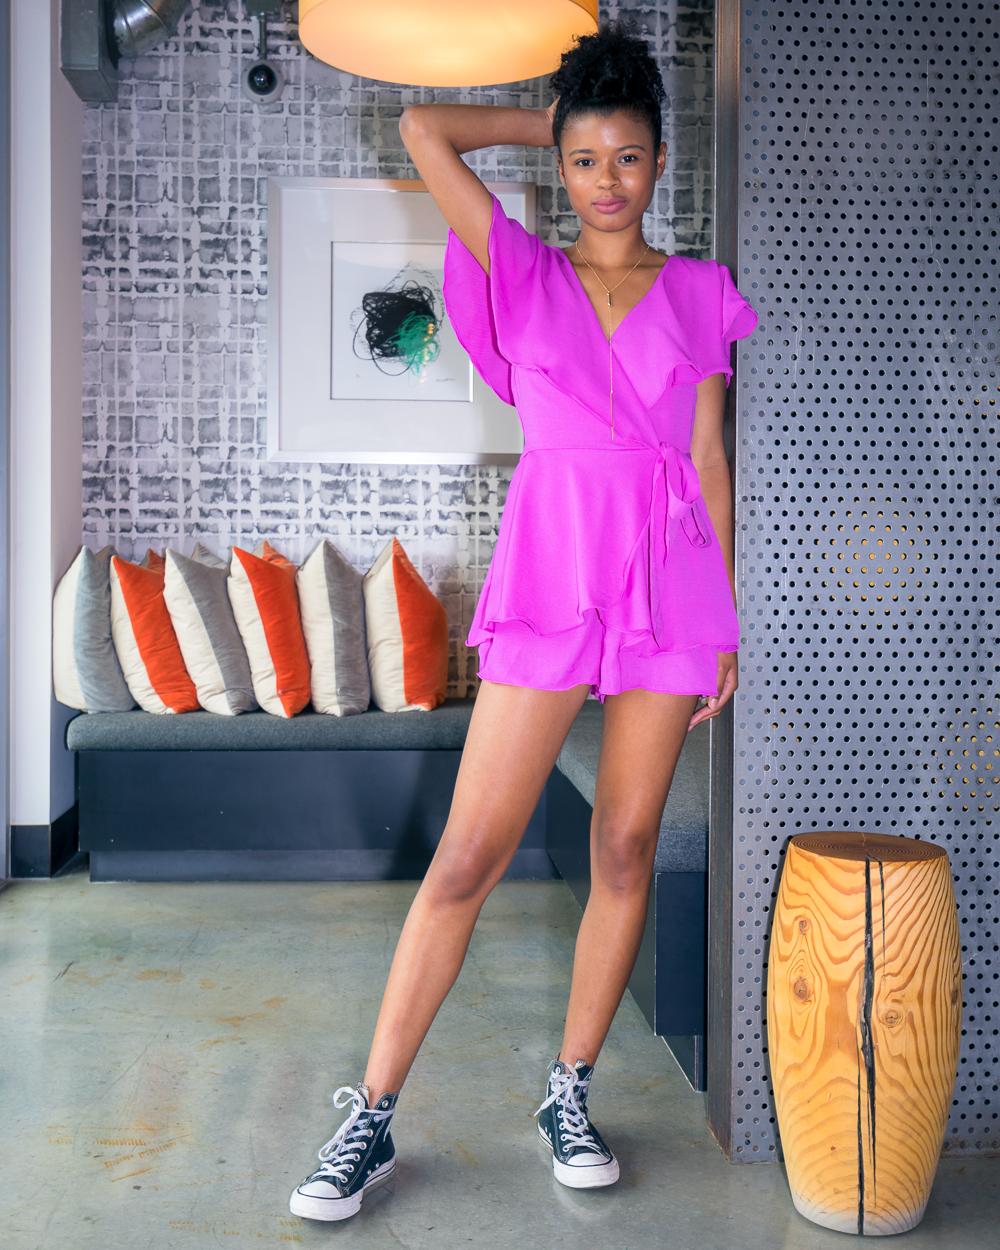 violet boutique may 30 2018-153 (1).jpg